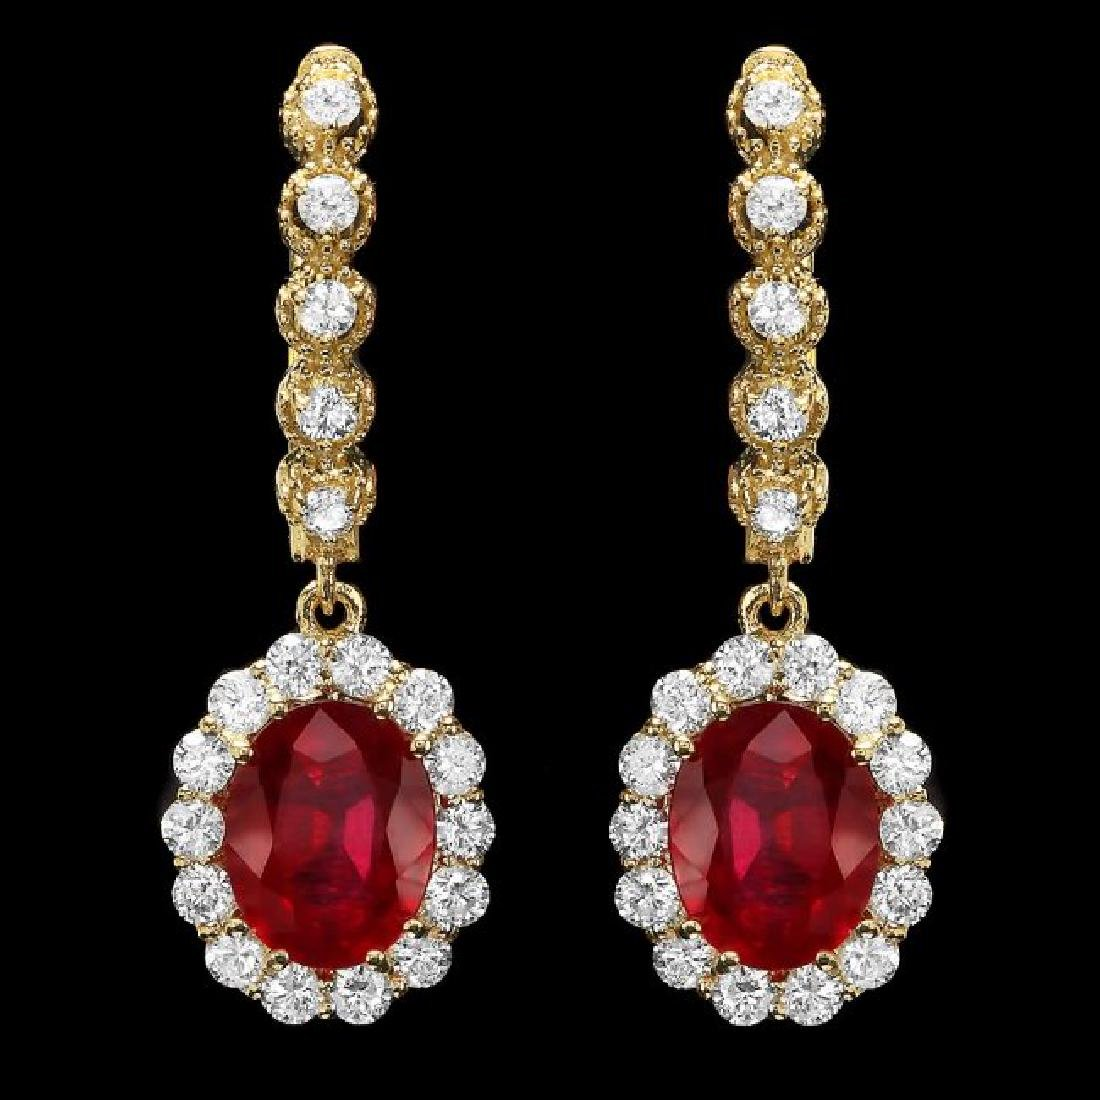 14k Gold 5.00ct Ruby 1.40ct Diamond Earrings